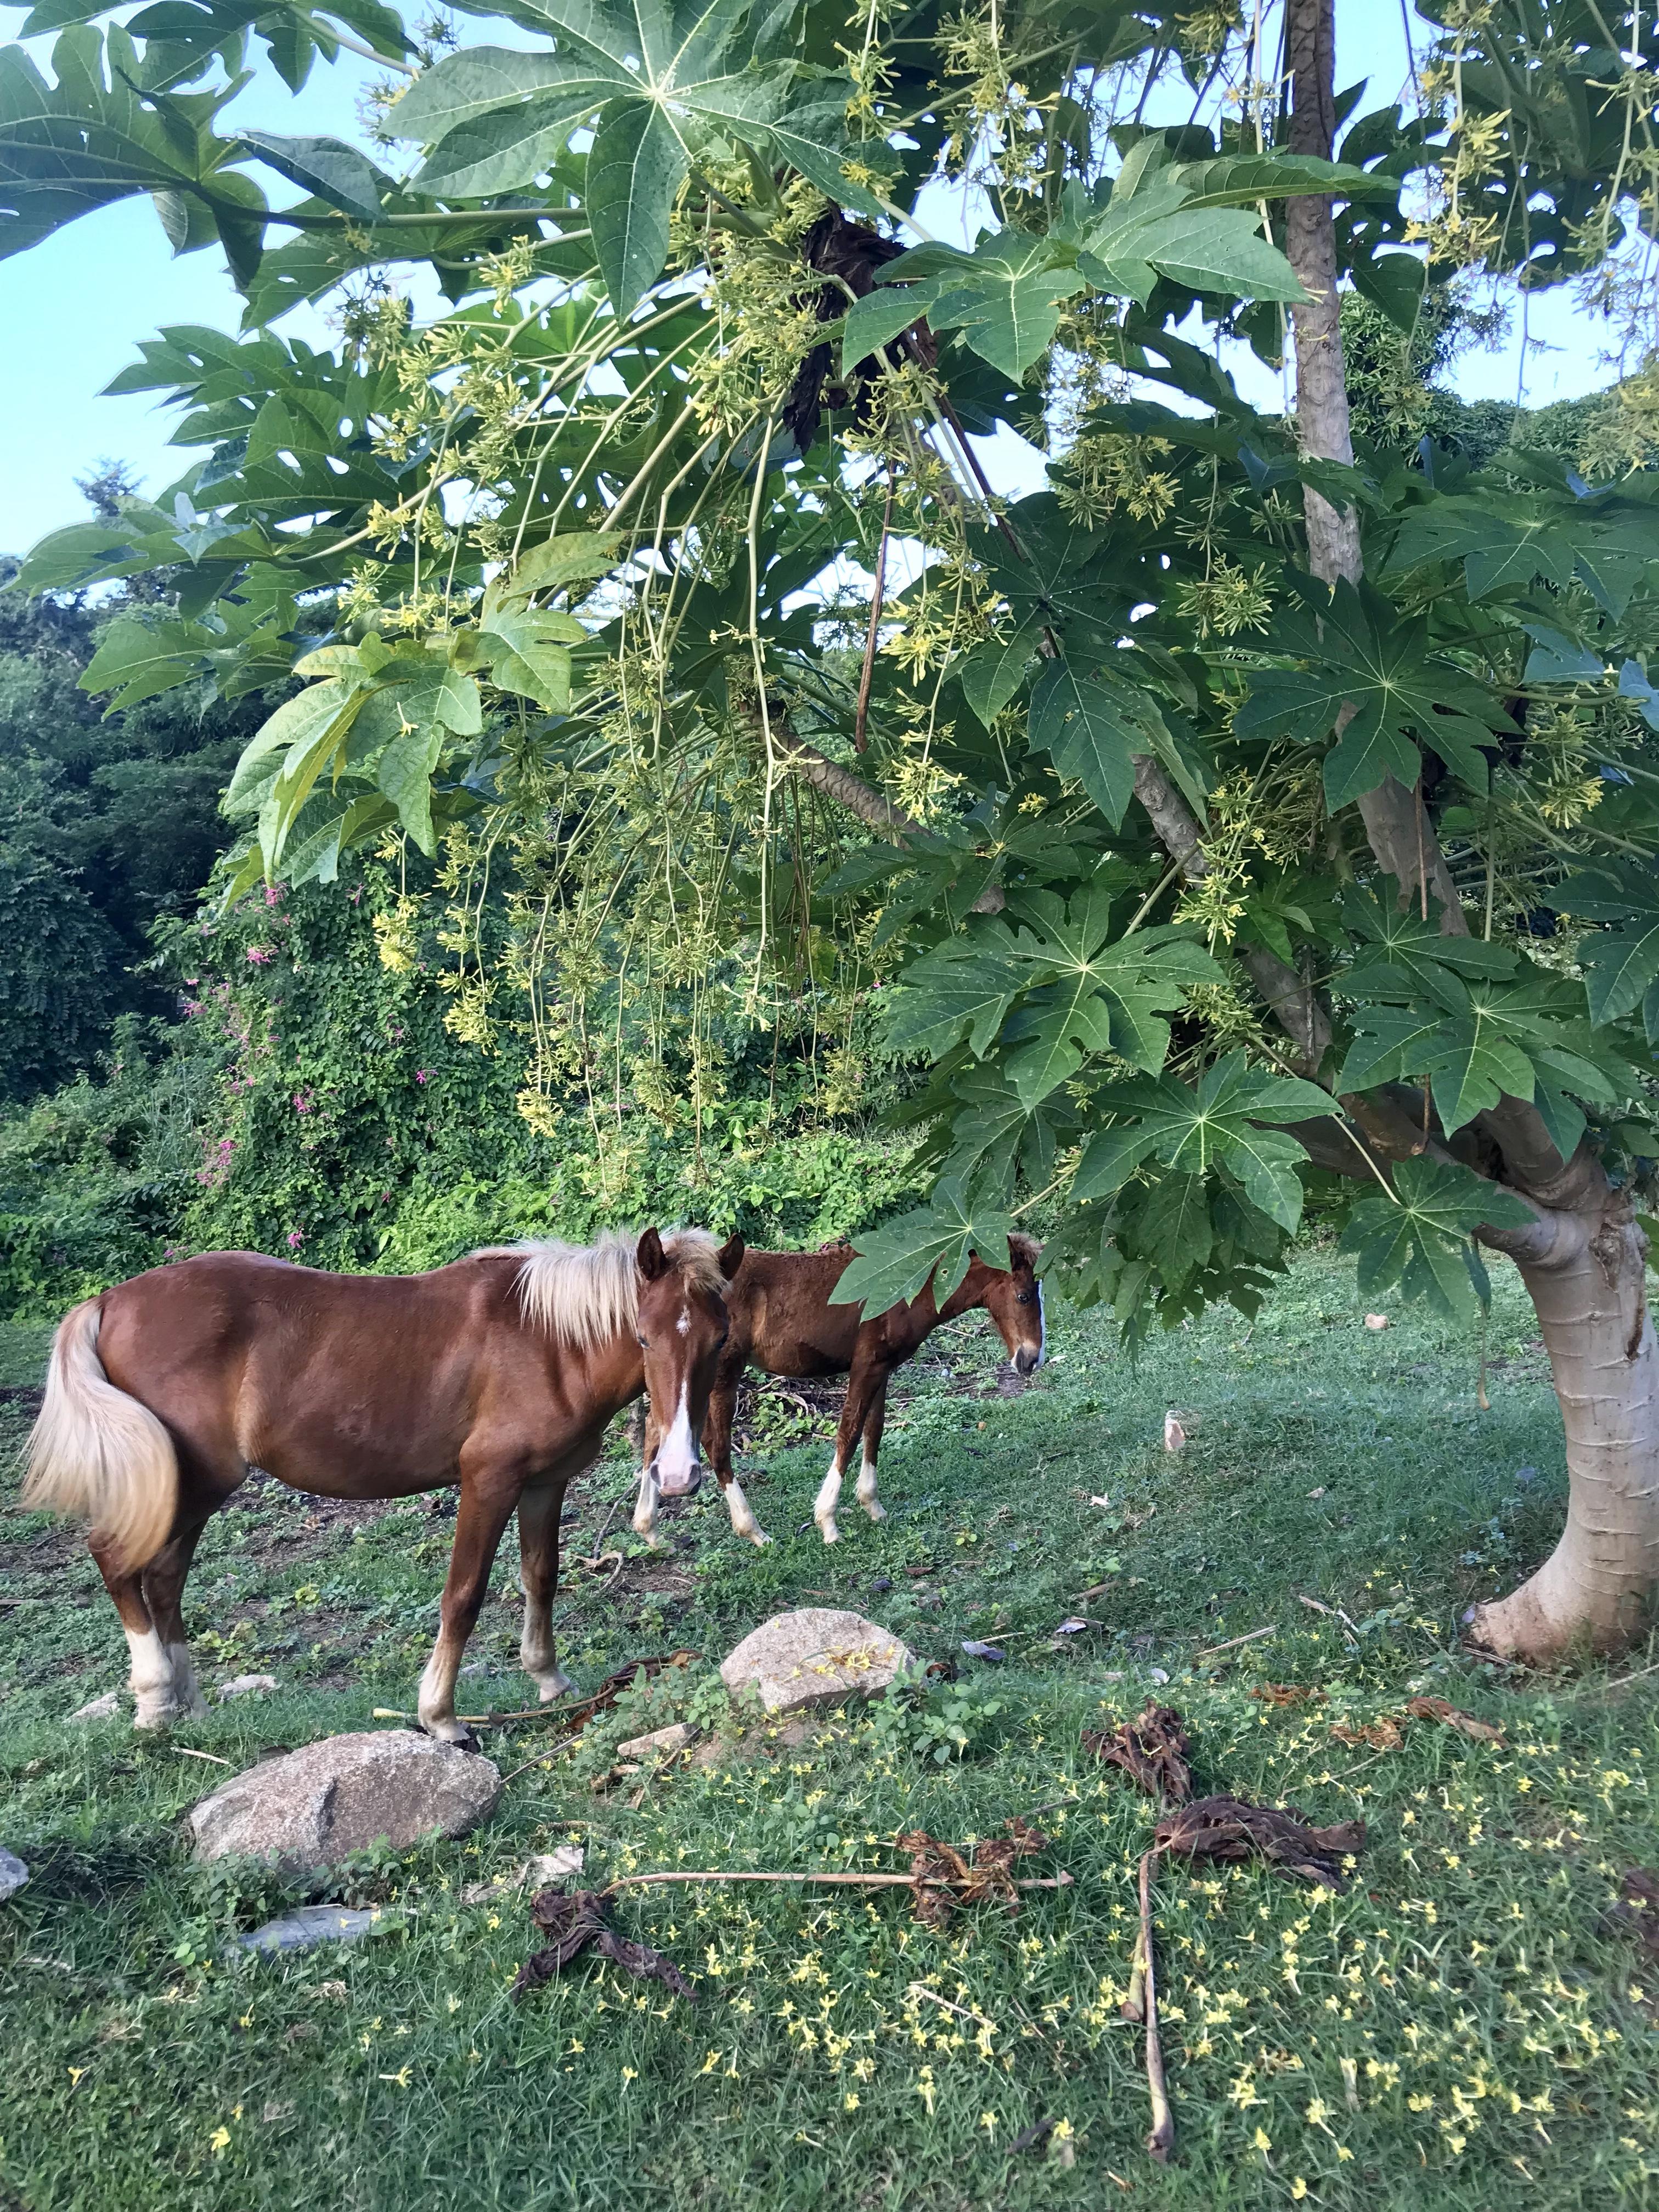 Wild horses in Vieques